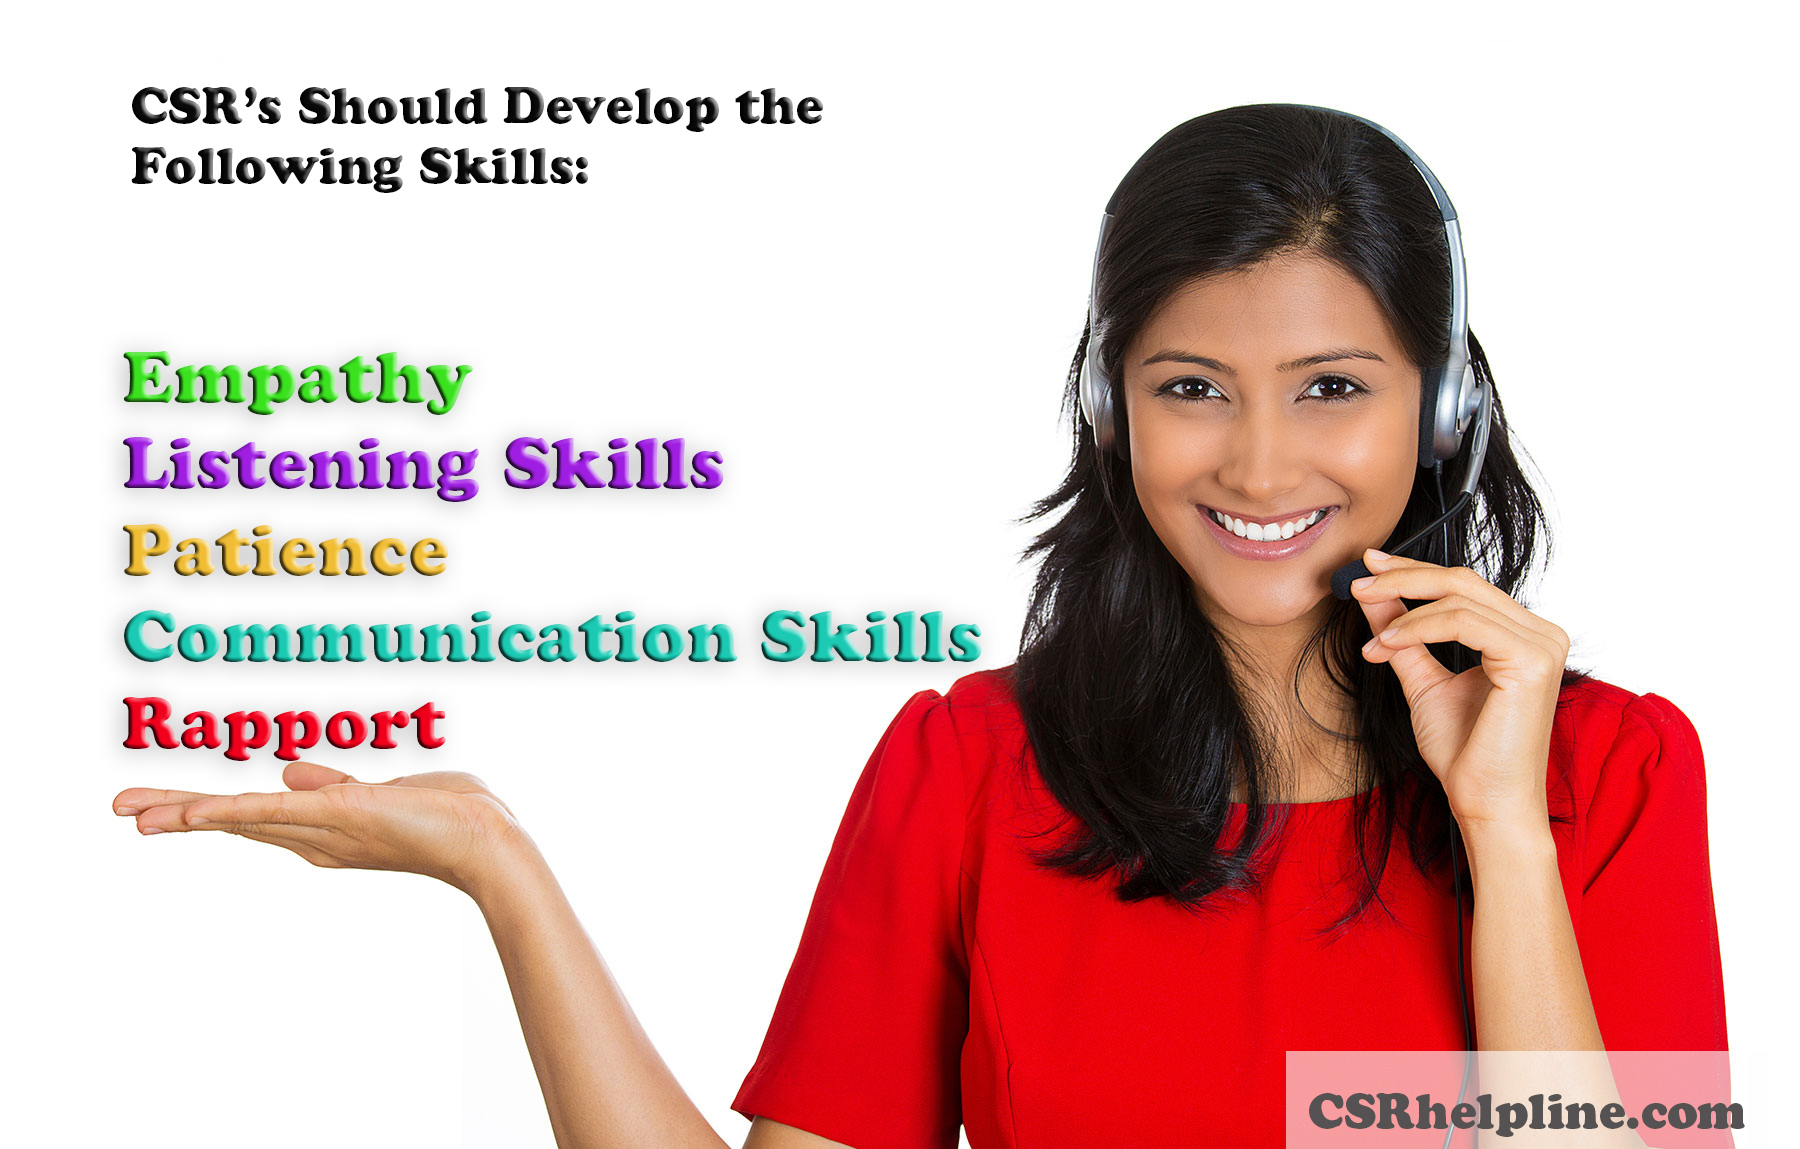 five important skills a customer service rep should possess csr empathy